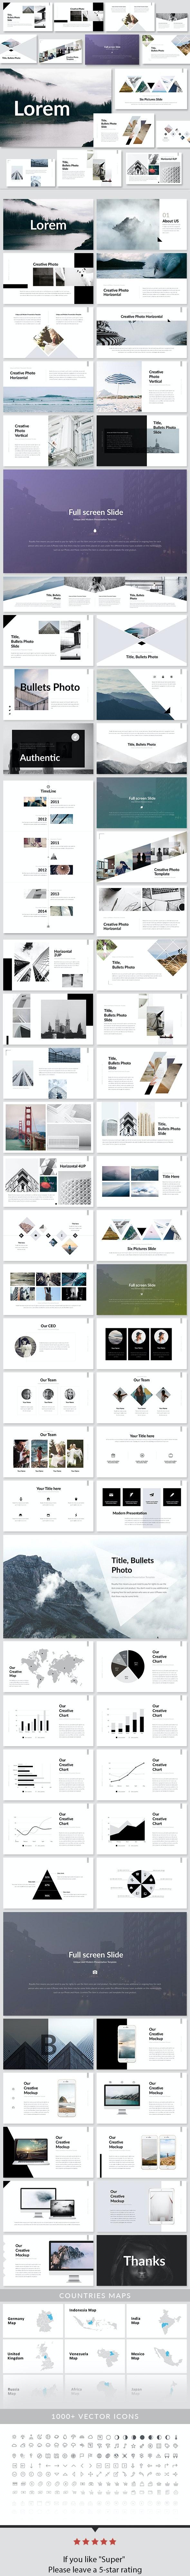 Lorem - PowerPoint Presentation Template - Creative PowerPoint Templates